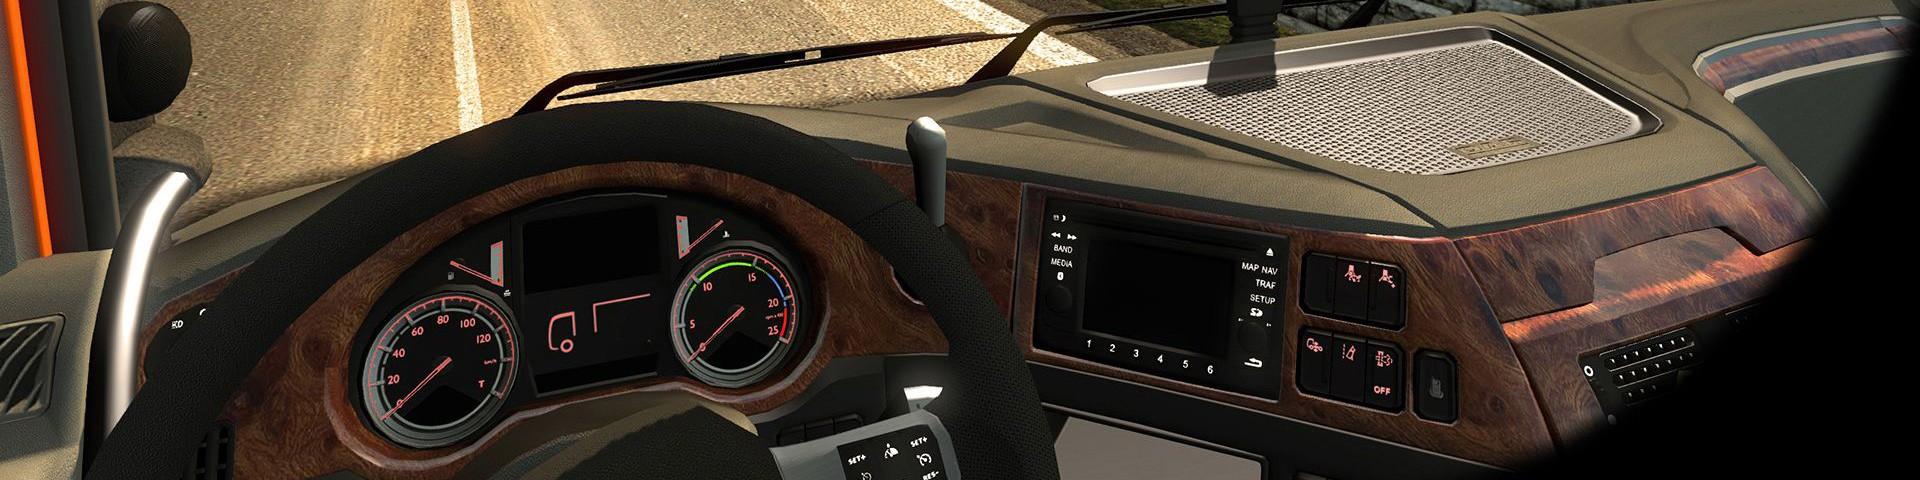 Euro Truck Simulator 2 For Pc Origin